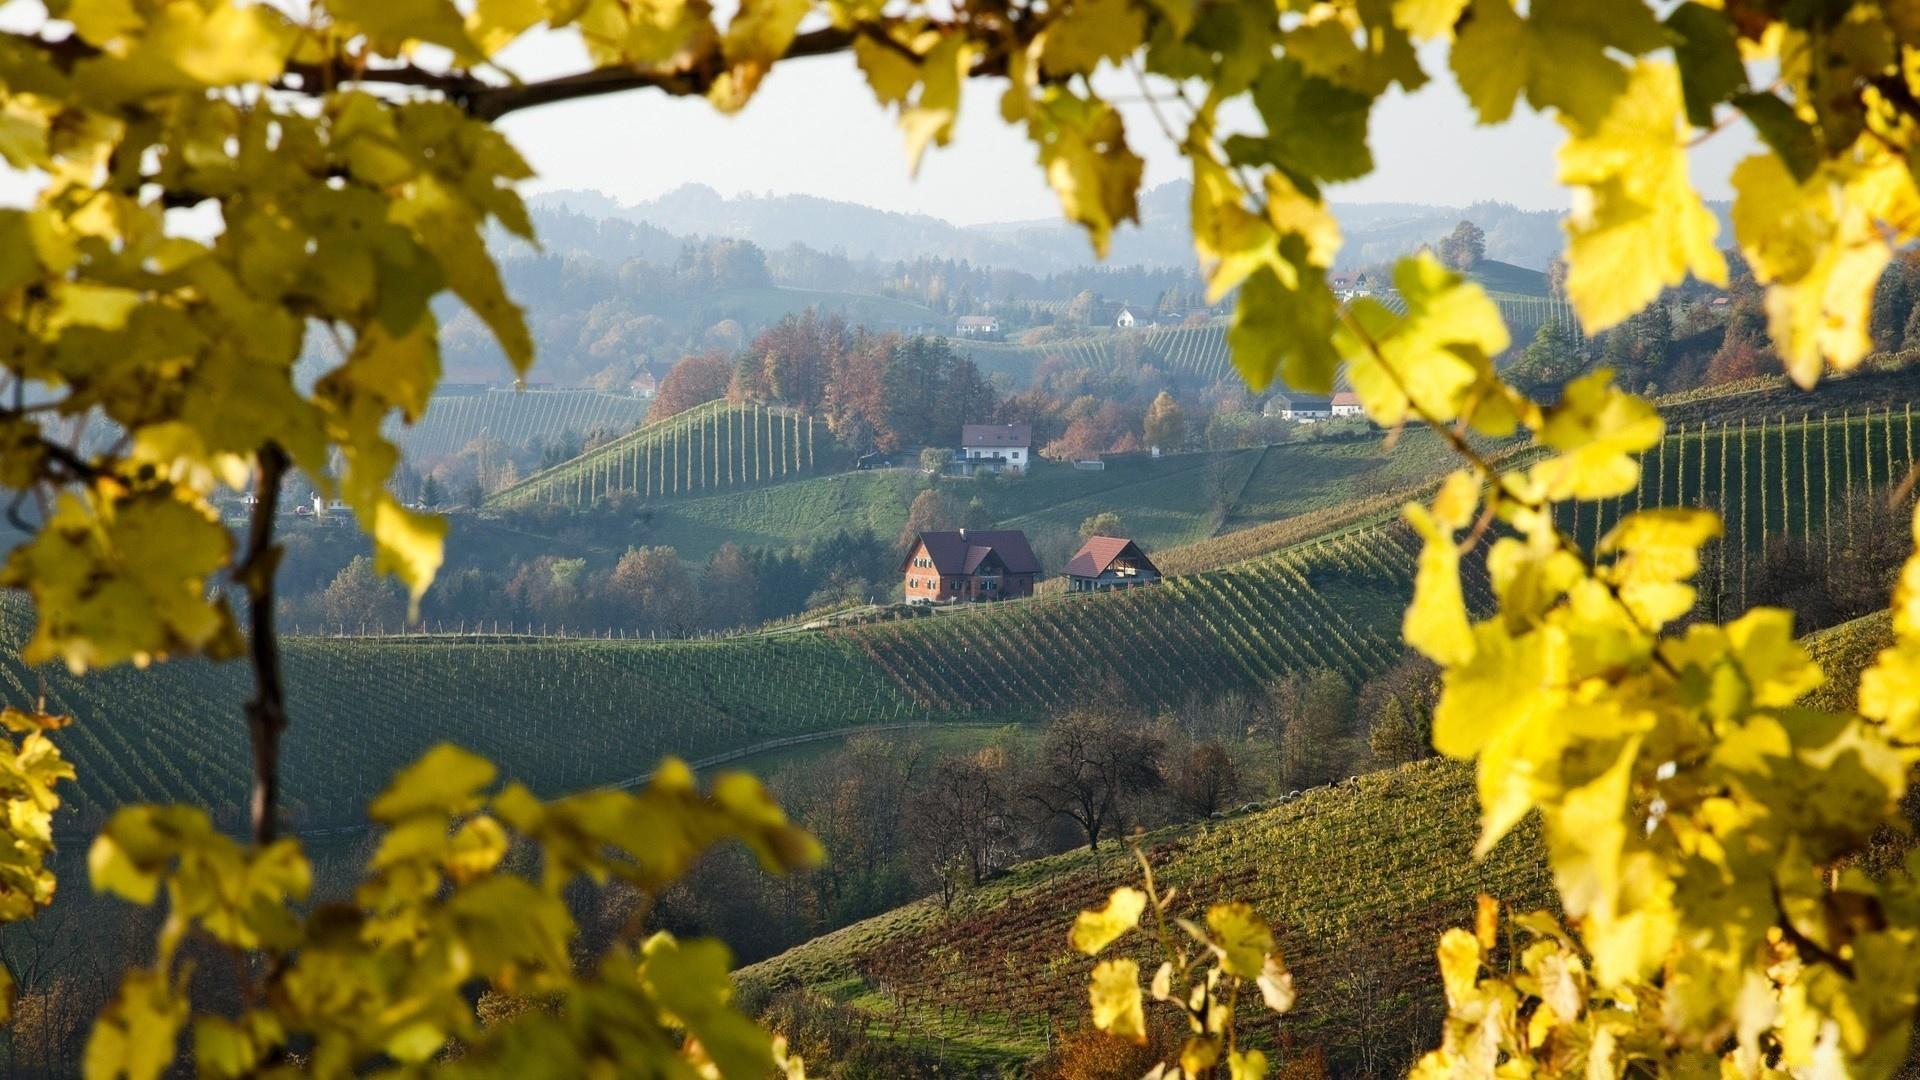 Vineyard 1920x1080 wallpaper